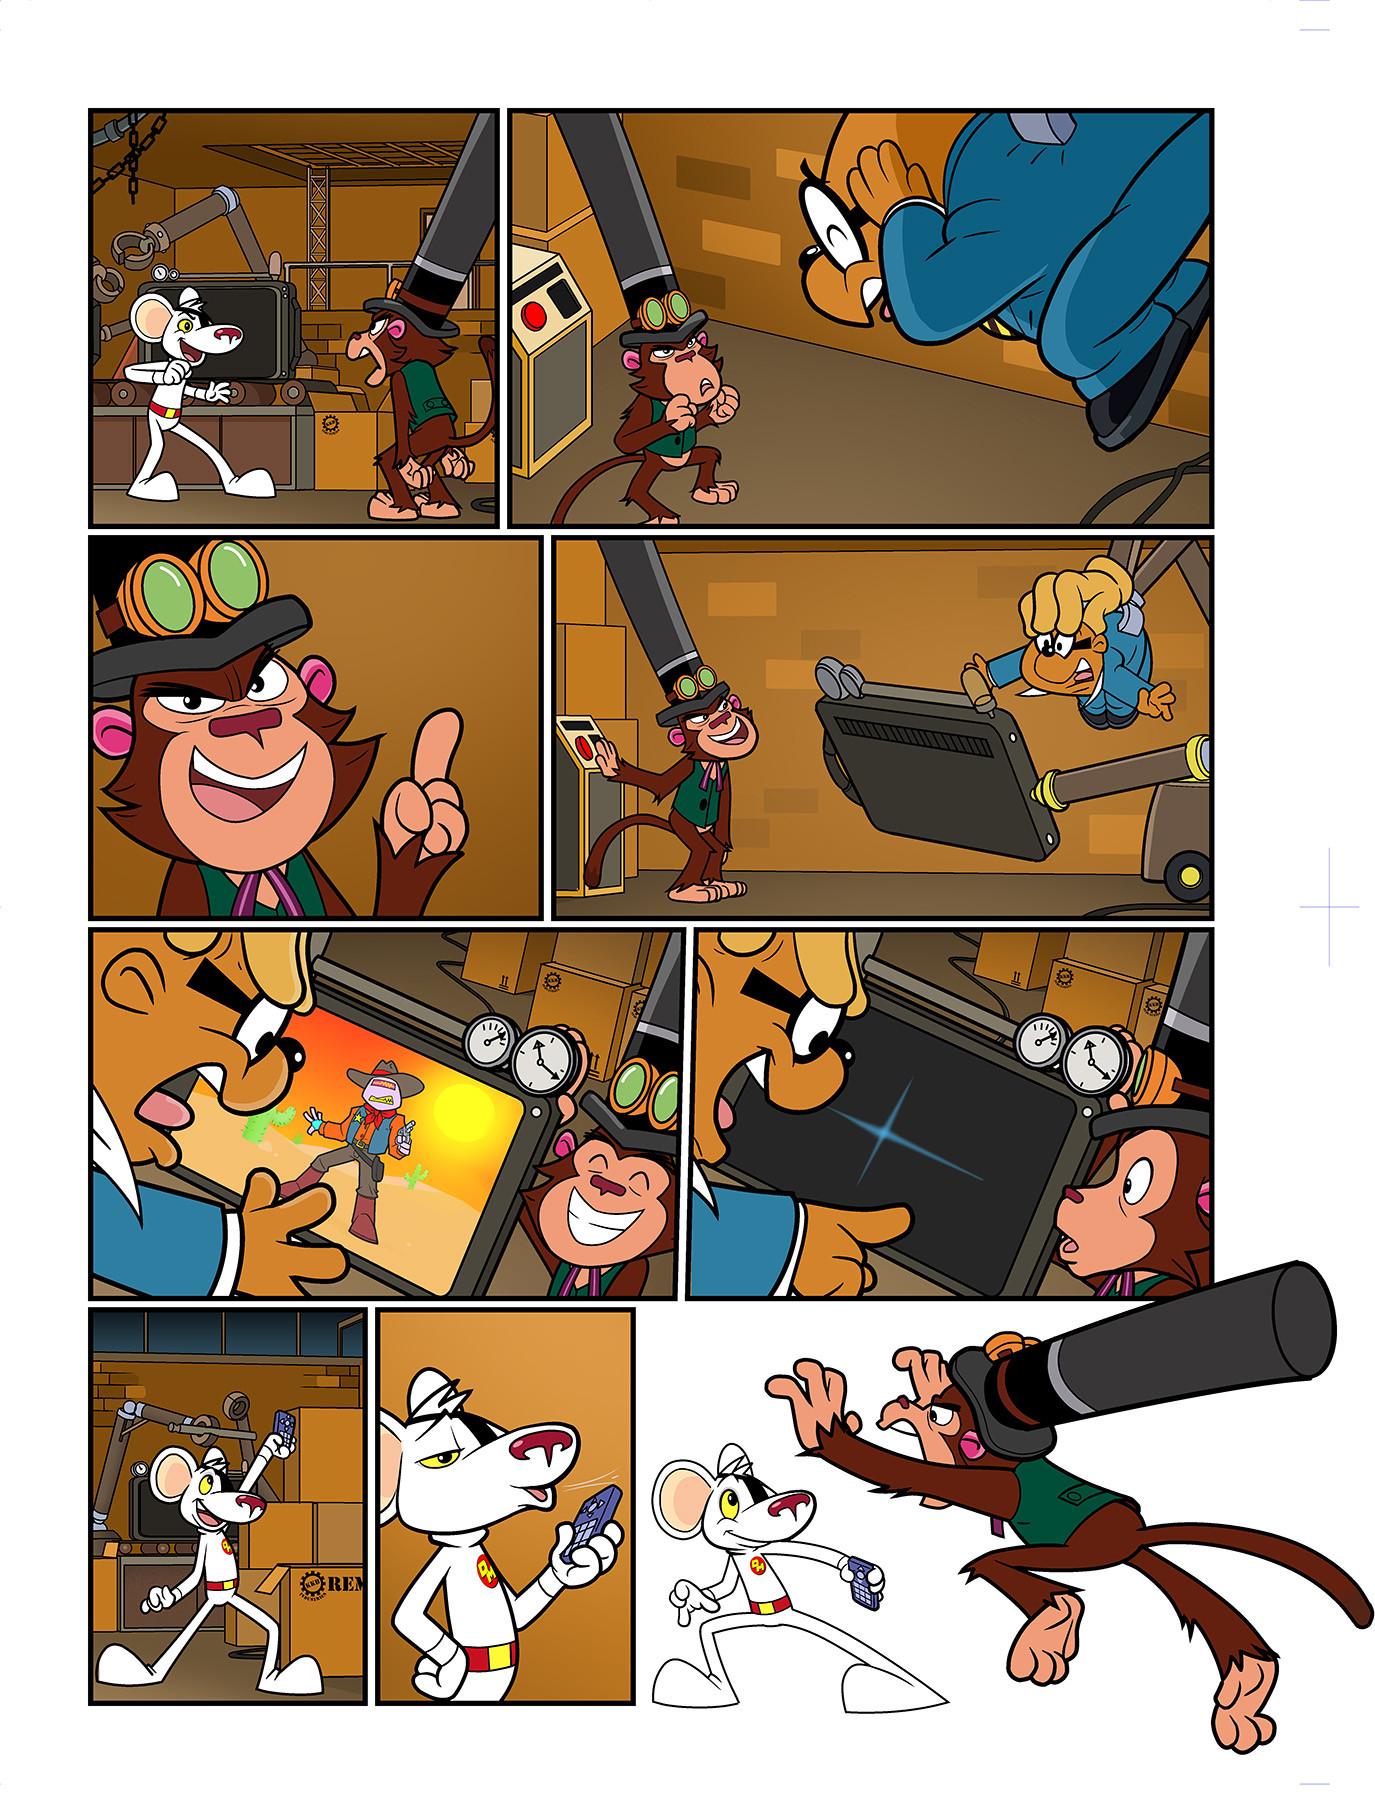 Joe amp rob sharp dm comic issue 10 page 06